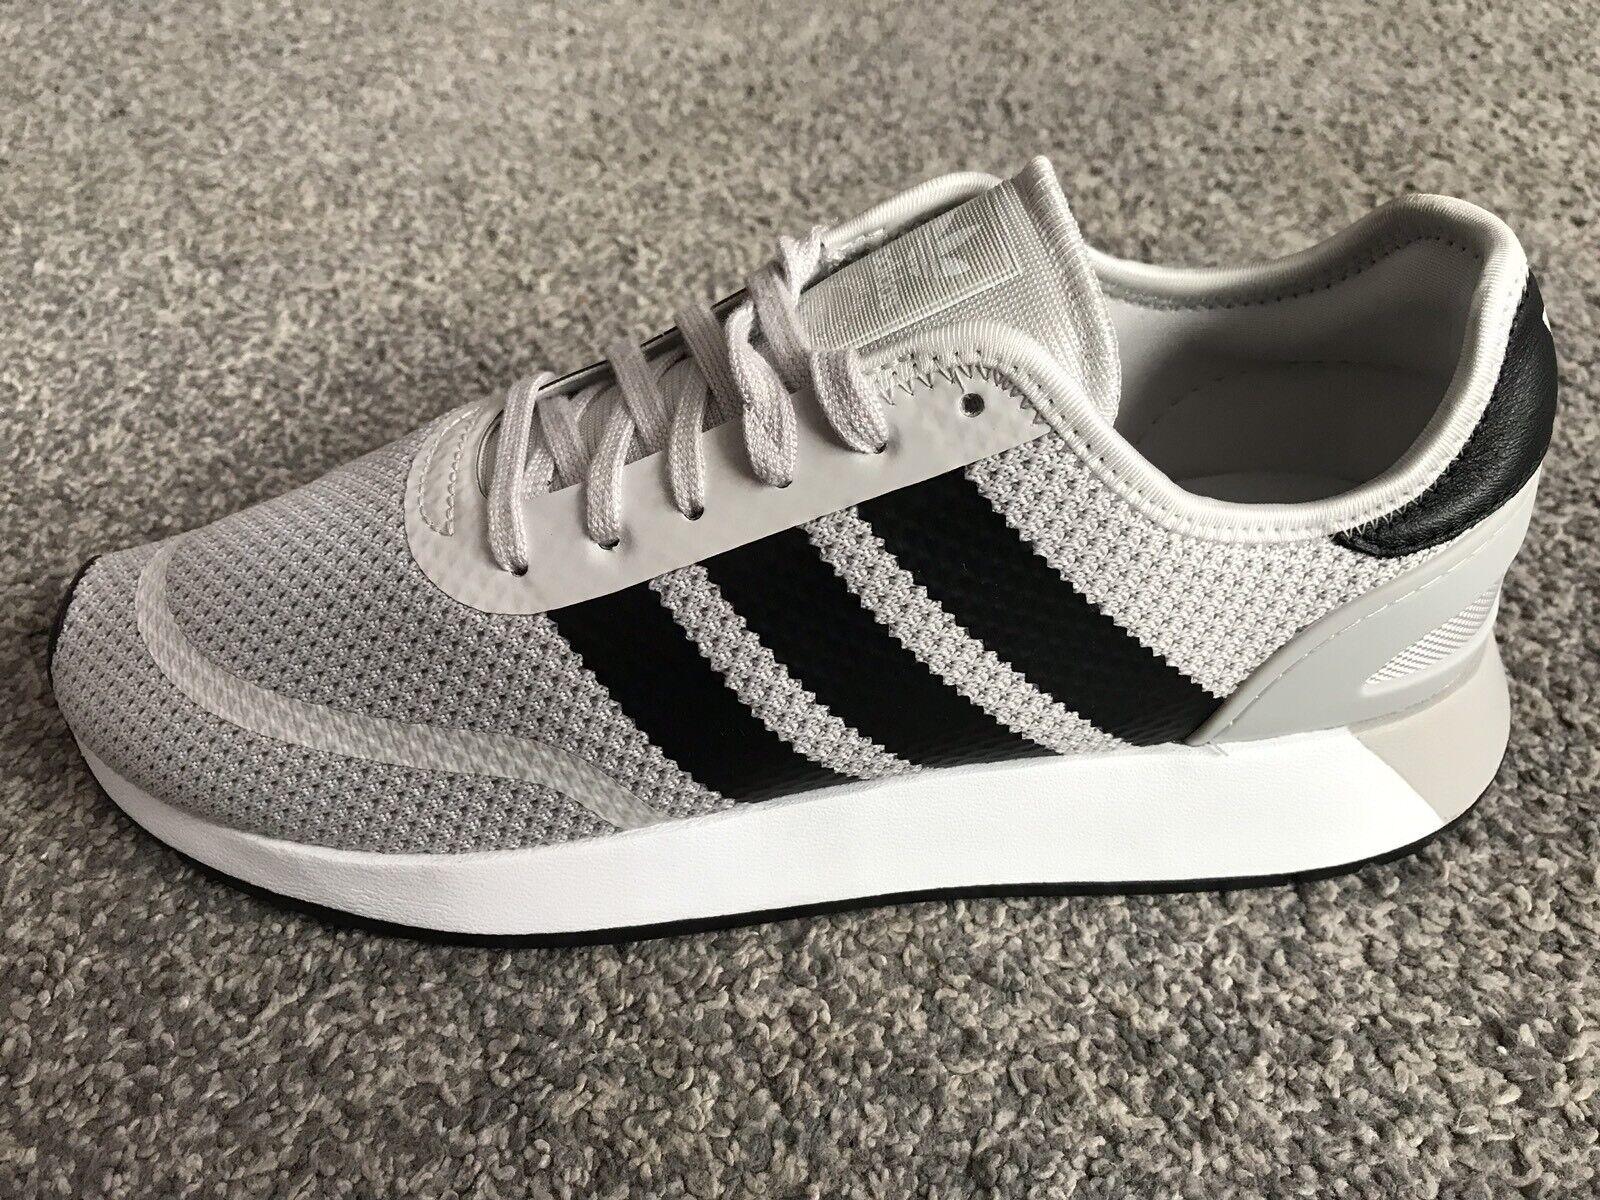 Adidas Originales Iniki Runner 5923, gris-